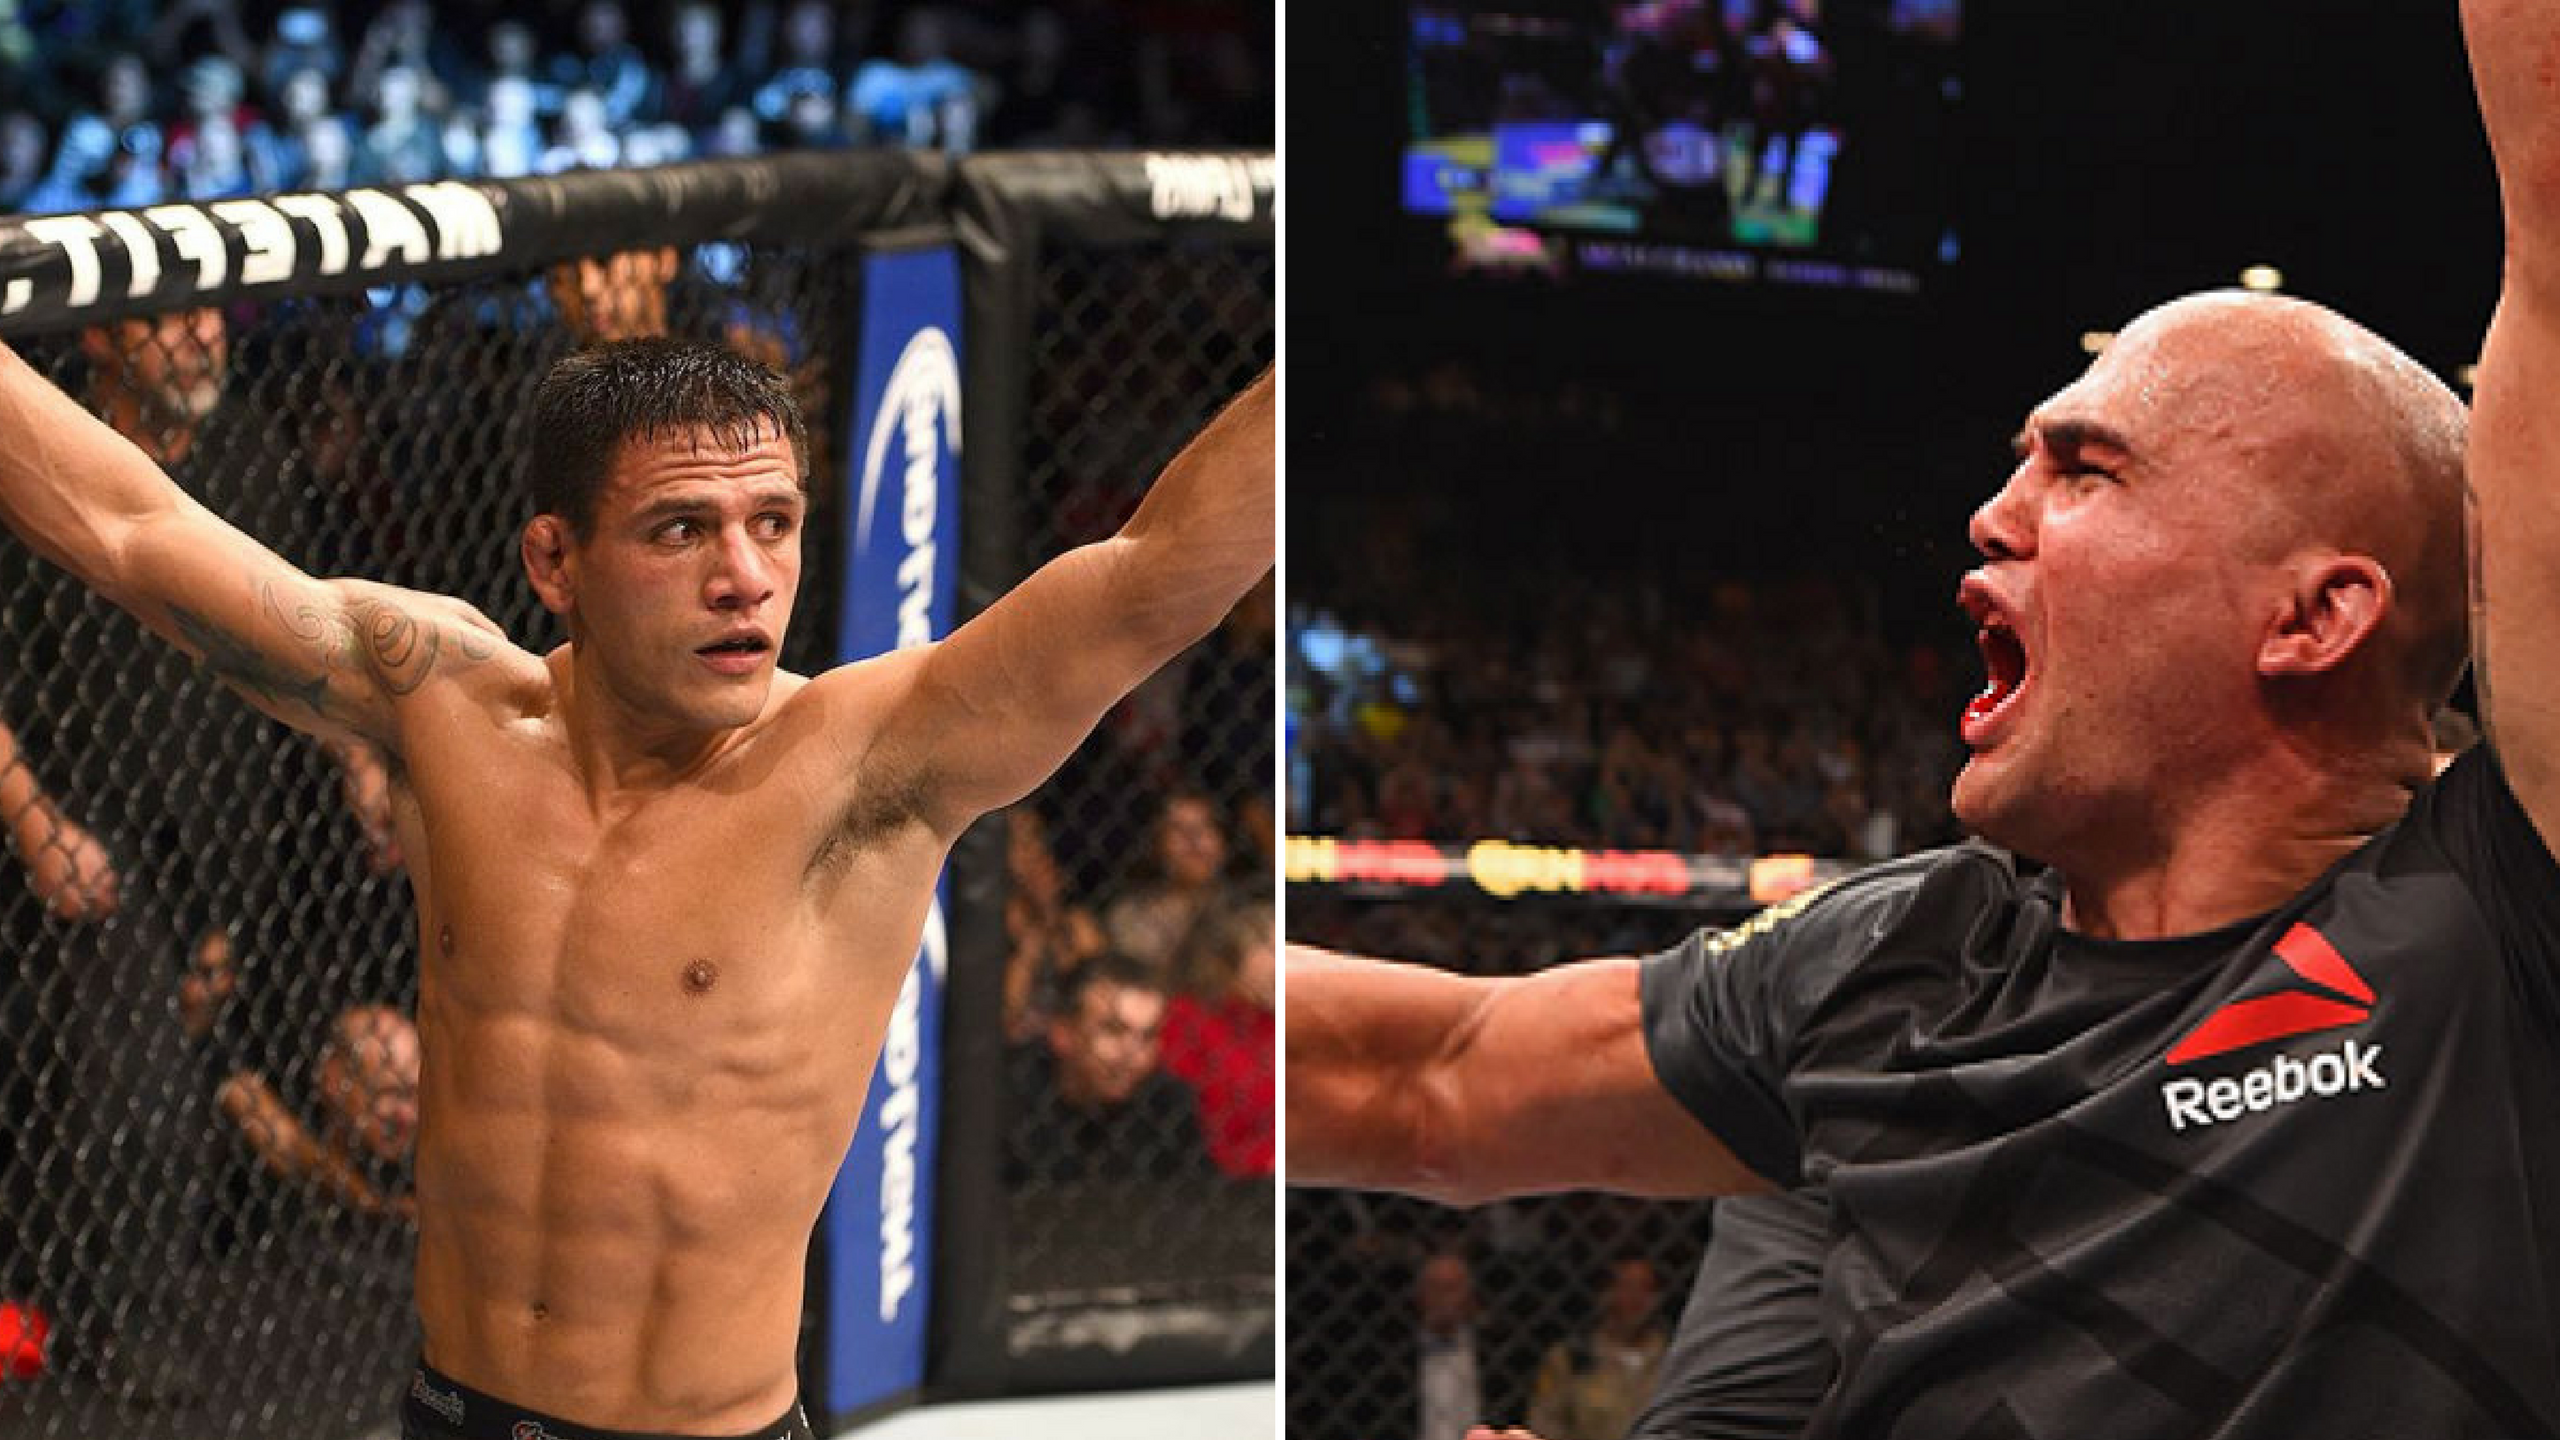 Robbie vs Rafael -